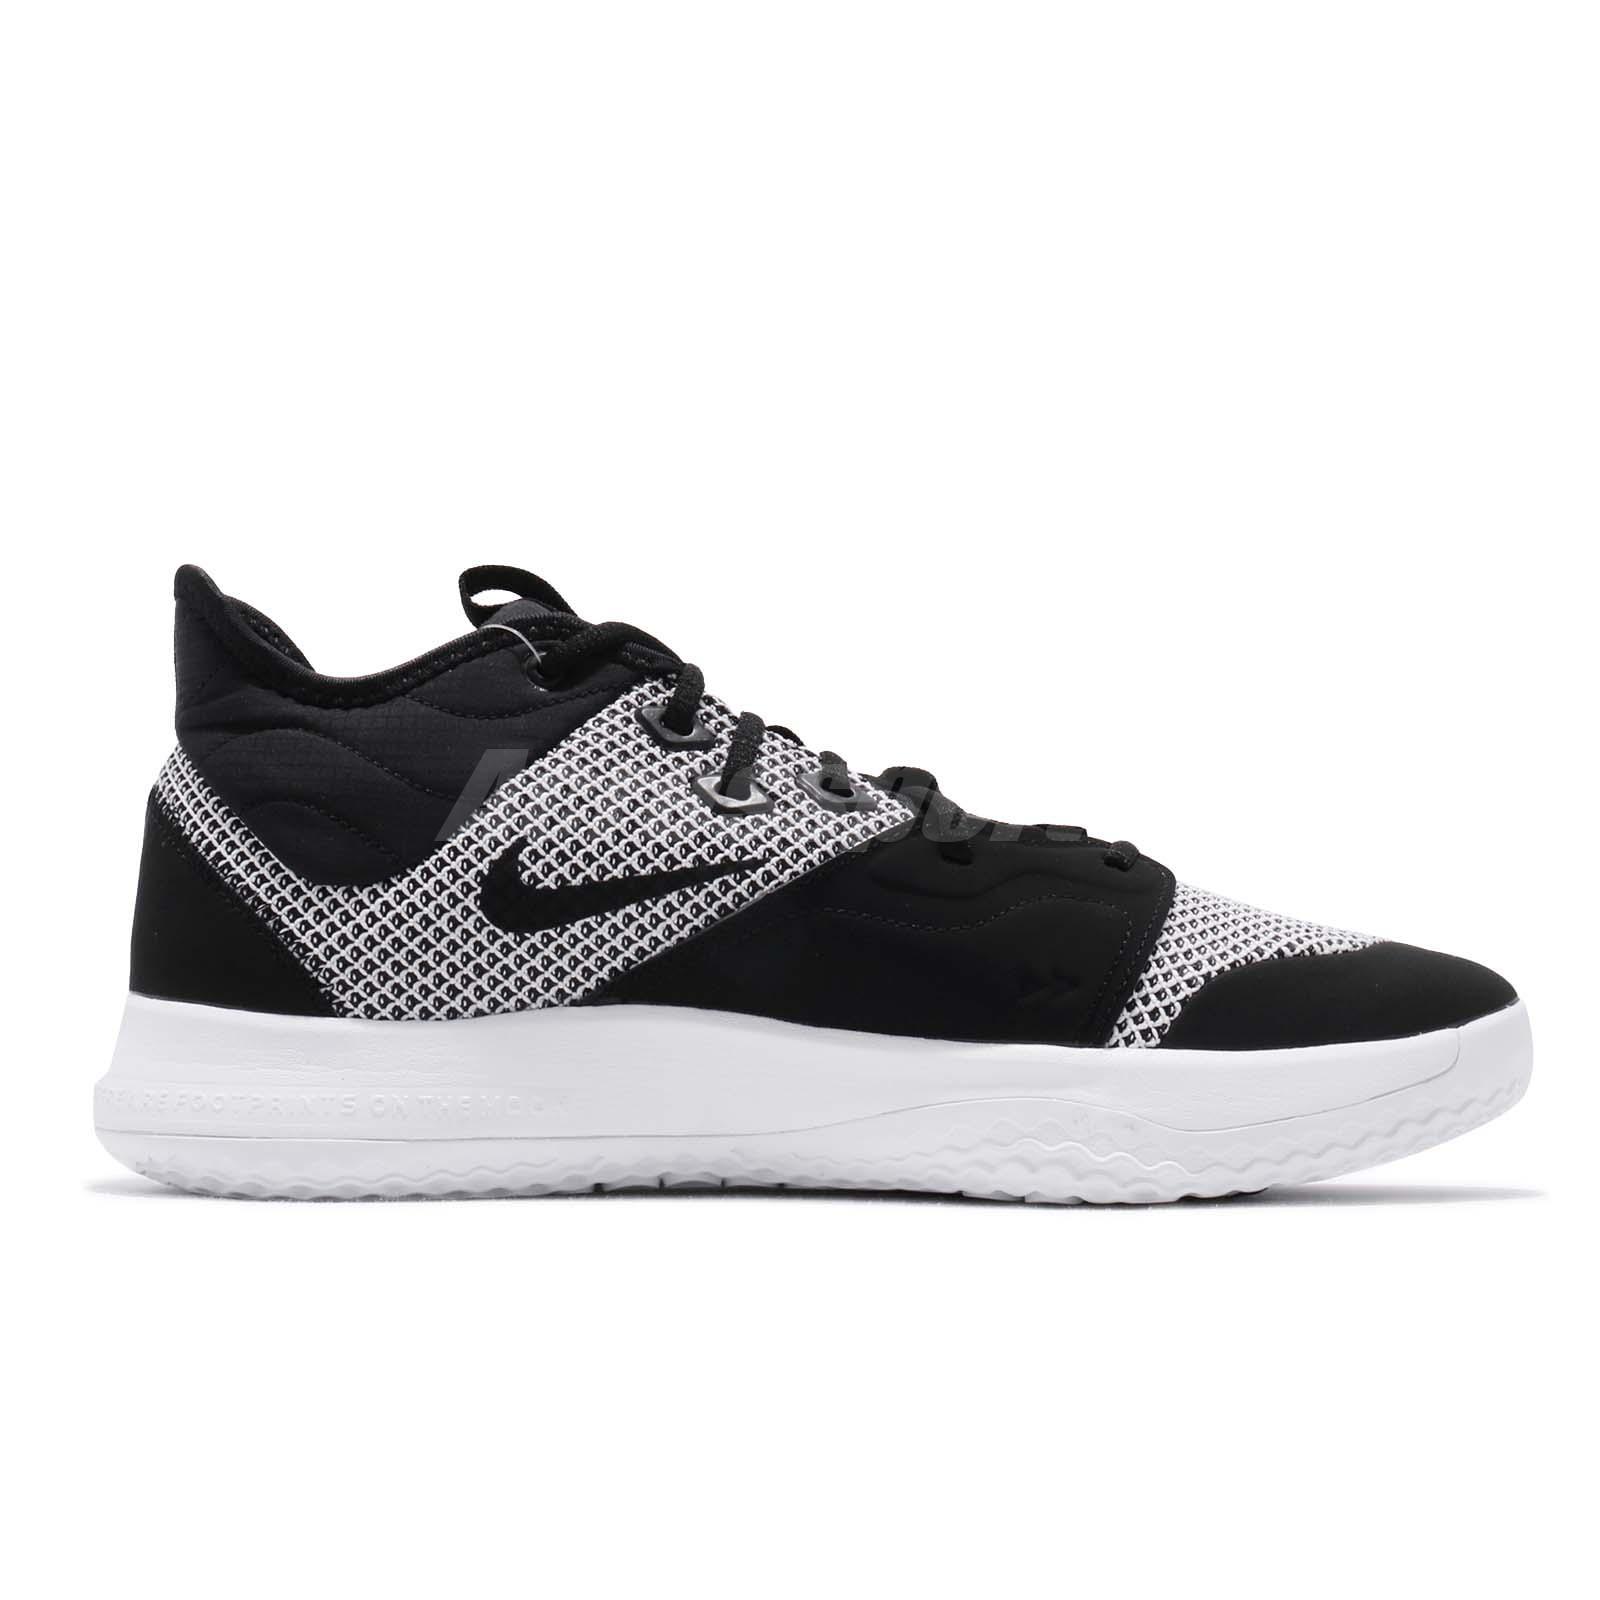 12f15d99c166 Nike PG 3 EP Paul George Black White Mens Basketball Shoes Sneakers ...